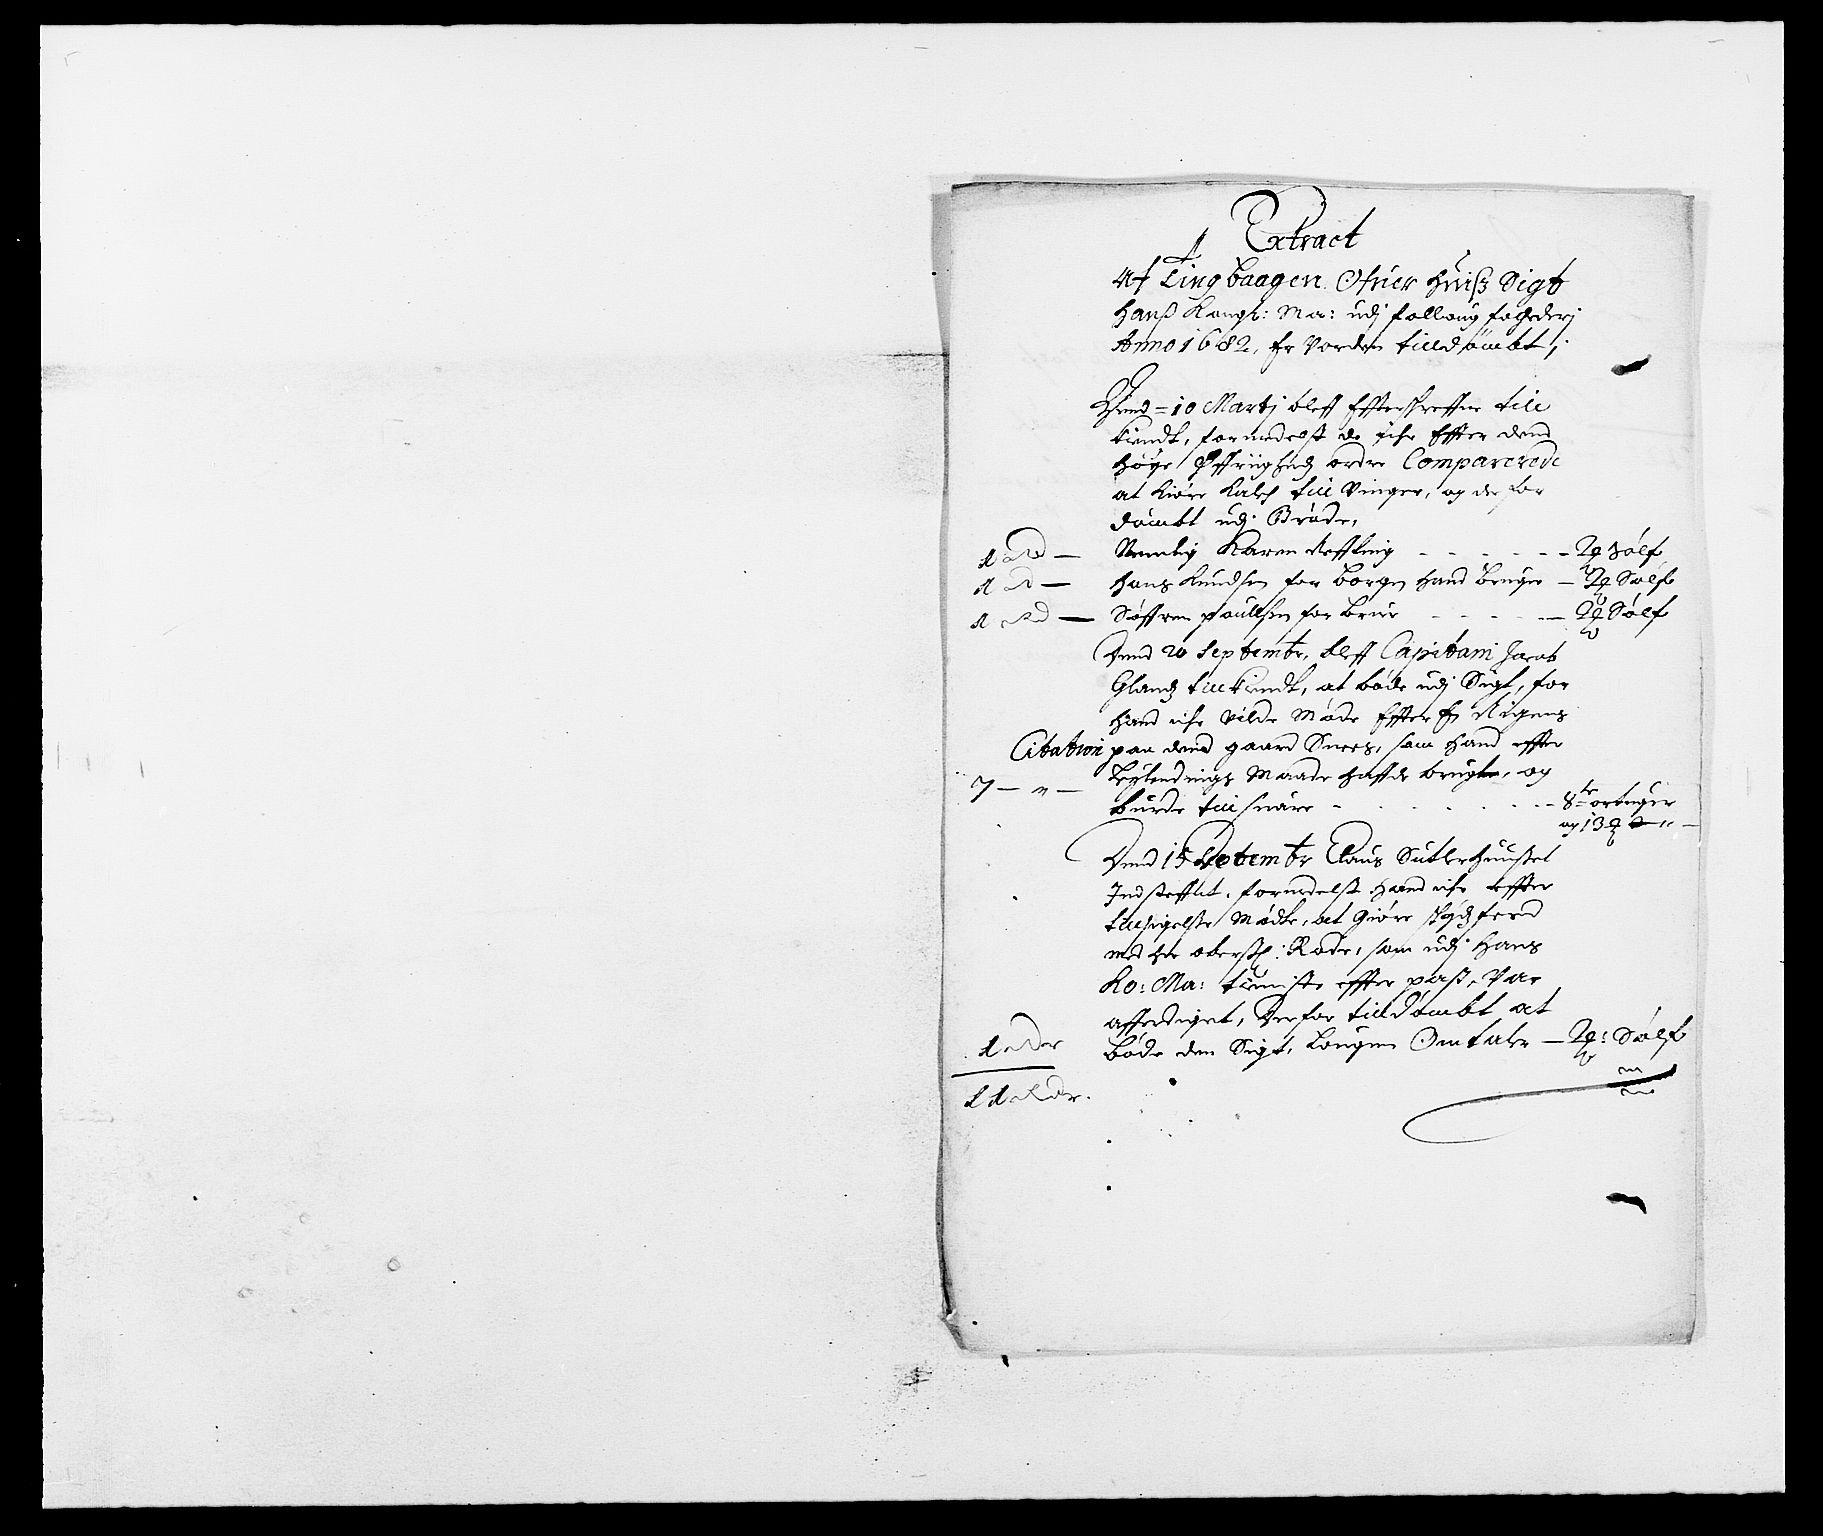 RA, Rentekammeret inntil 1814, Reviderte regnskaper, Fogderegnskap, R09/L0430: Fogderegnskap Follo, 1682-1683, s. 143